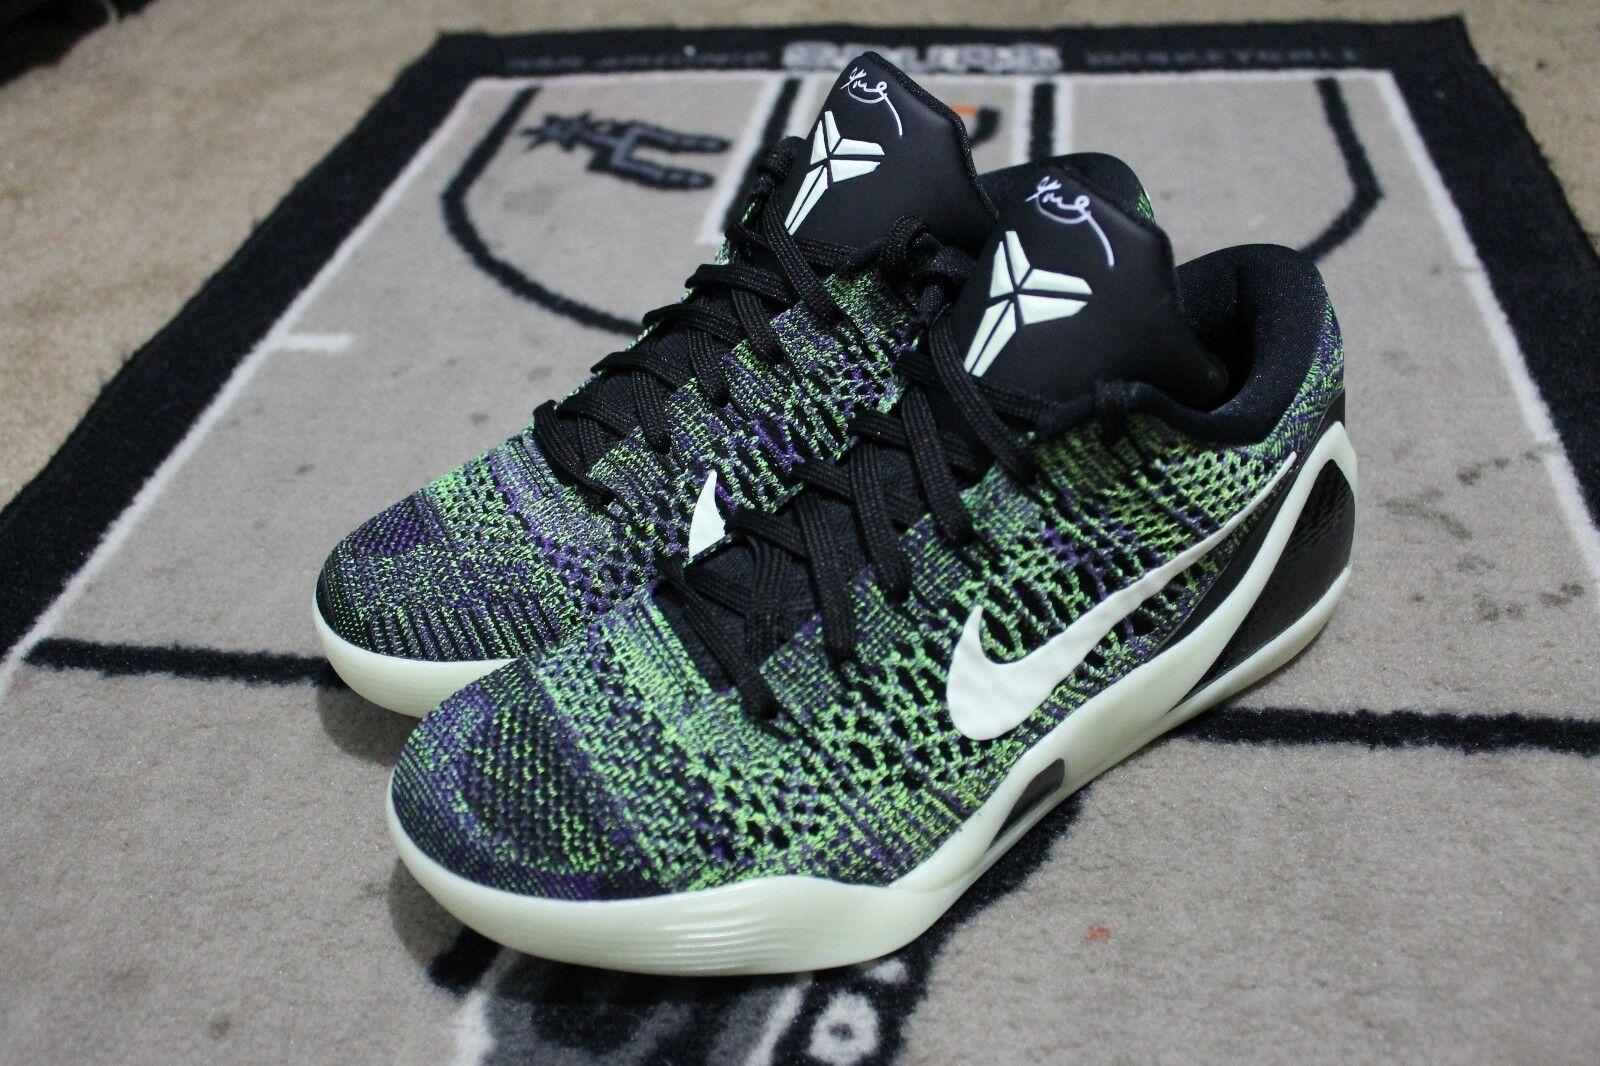 NEW Nike iD Kobe 9 Elite Flyknit Mamba Moment SZ 8.5 Multicolor GLOW IN THE DARK